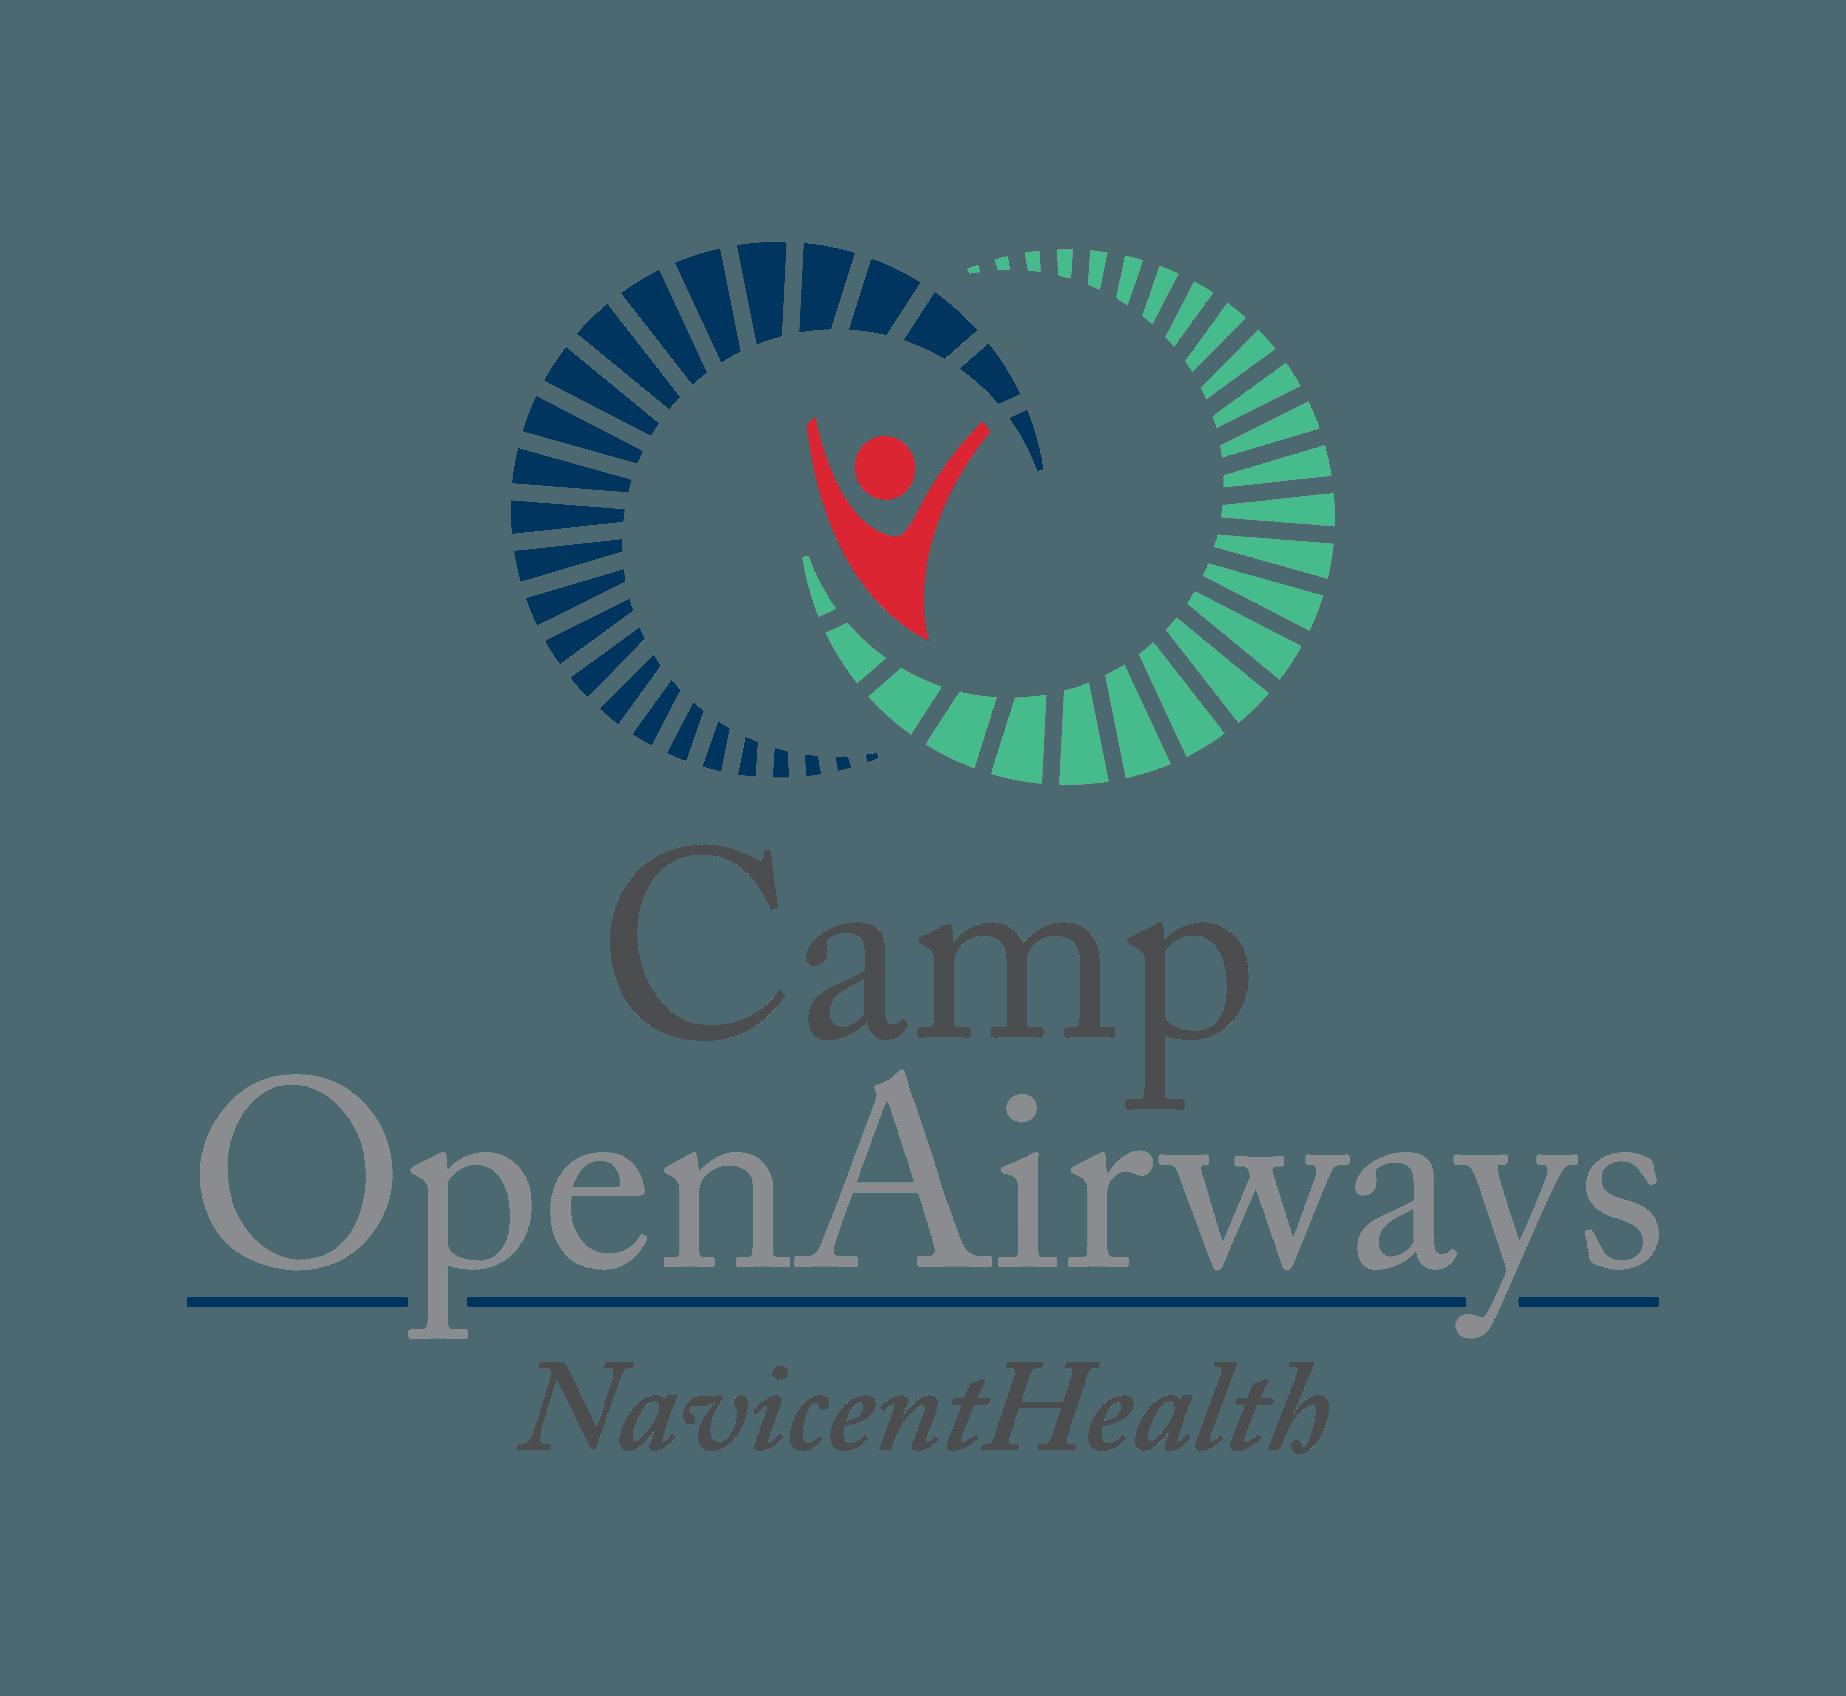 Navicent Camp Open Airways